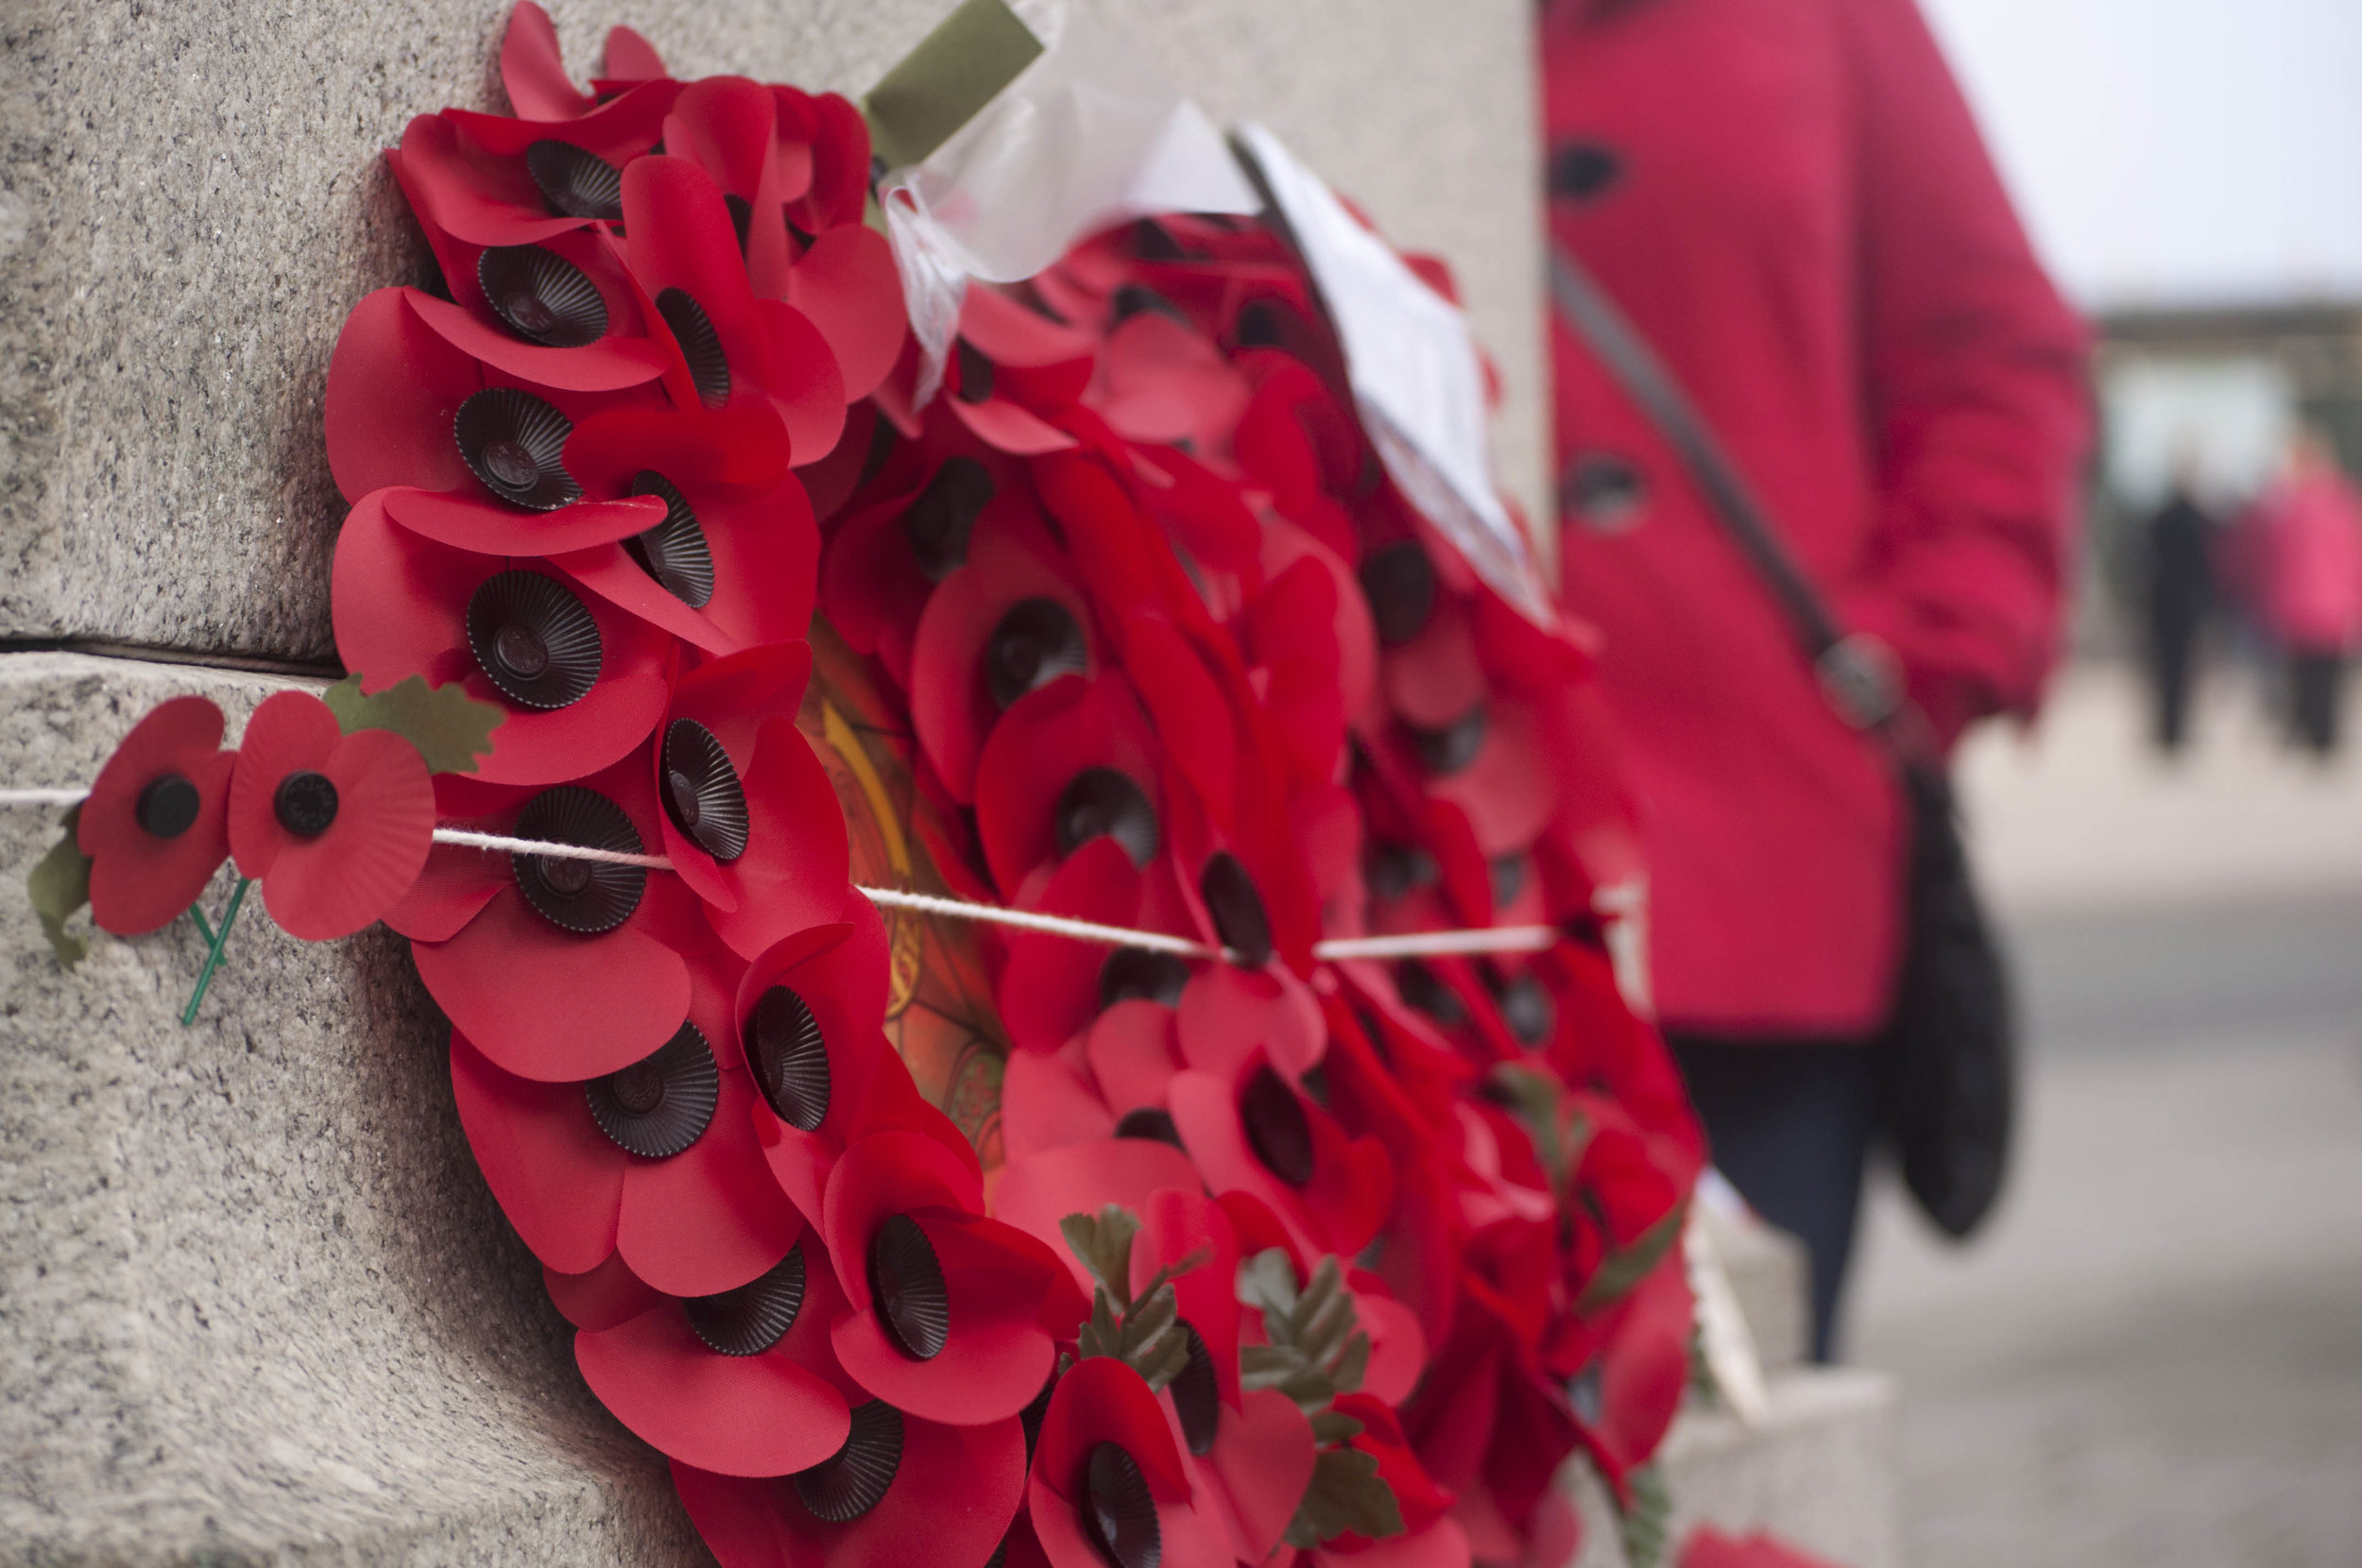 A wreath of poppies. (Lauren Turner/Flickr under  CC BY 2.0 )